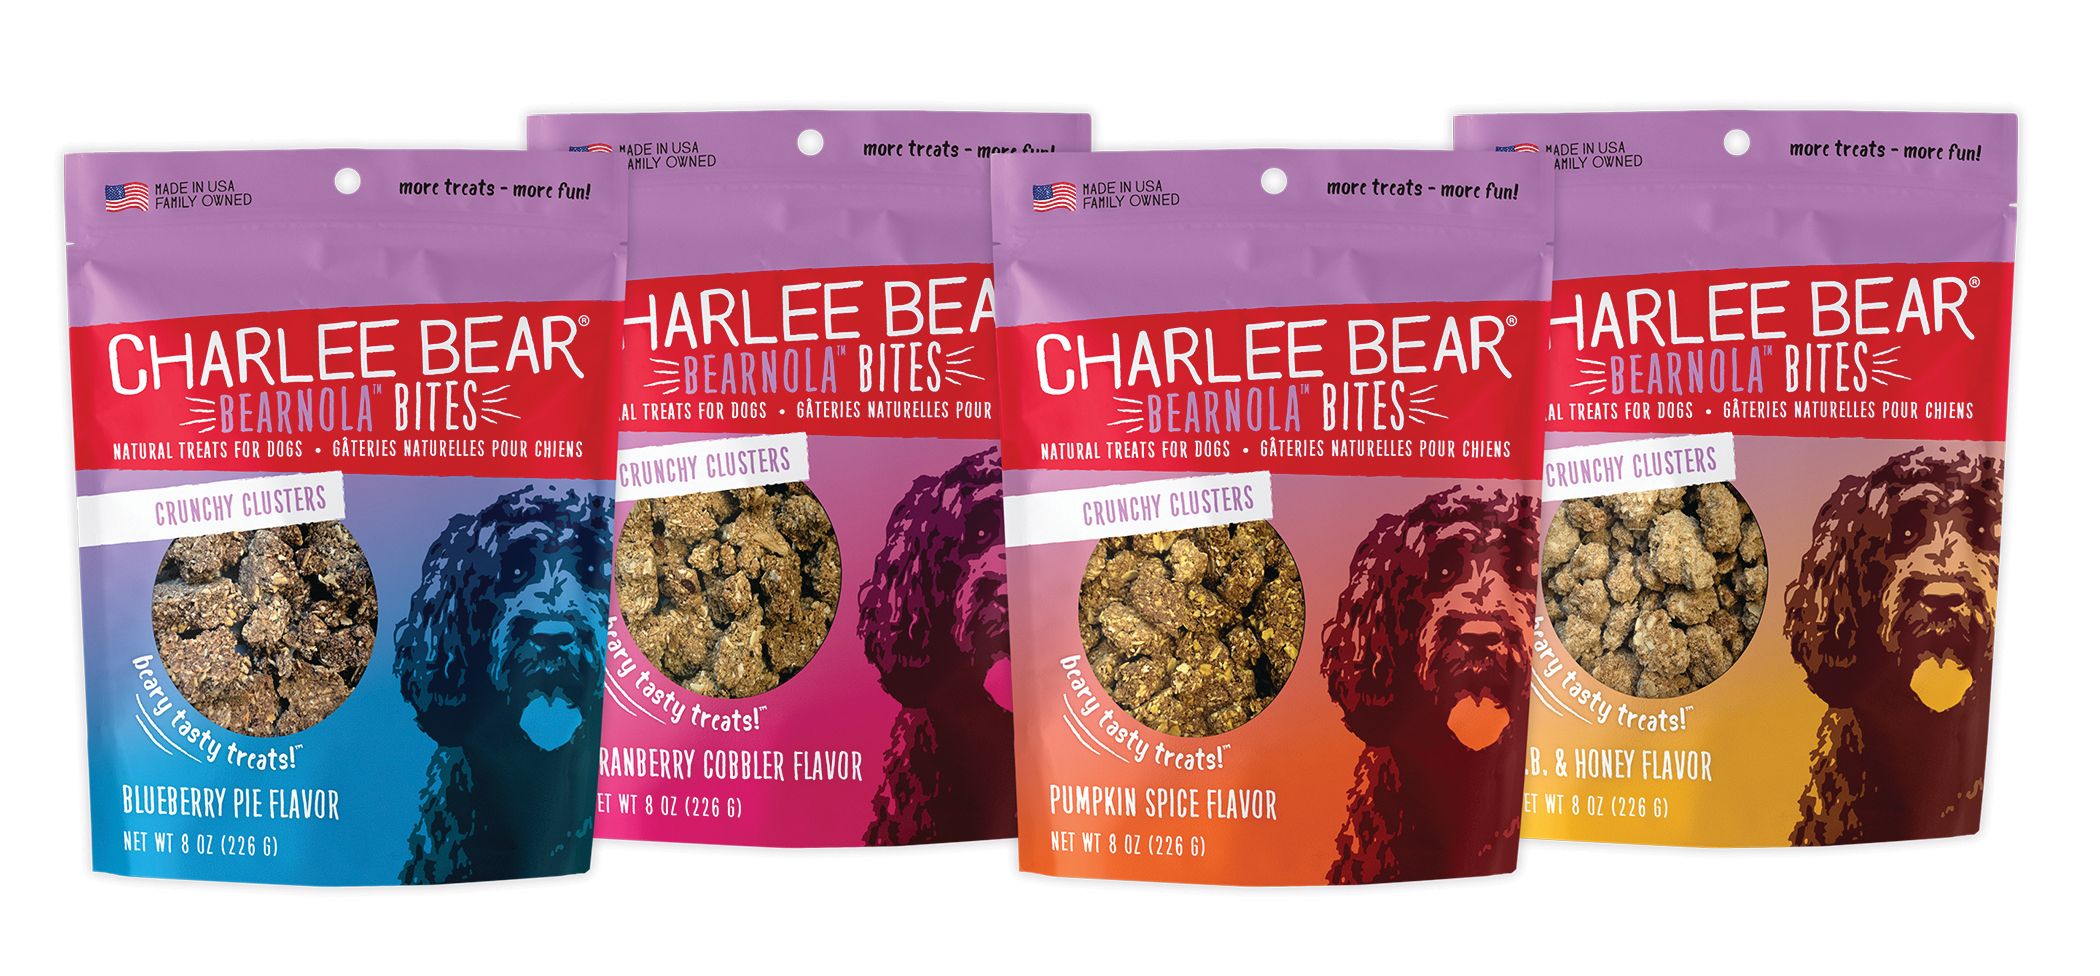 Charlee Bear Announces Bearnola Bites' SuperZoo Debut